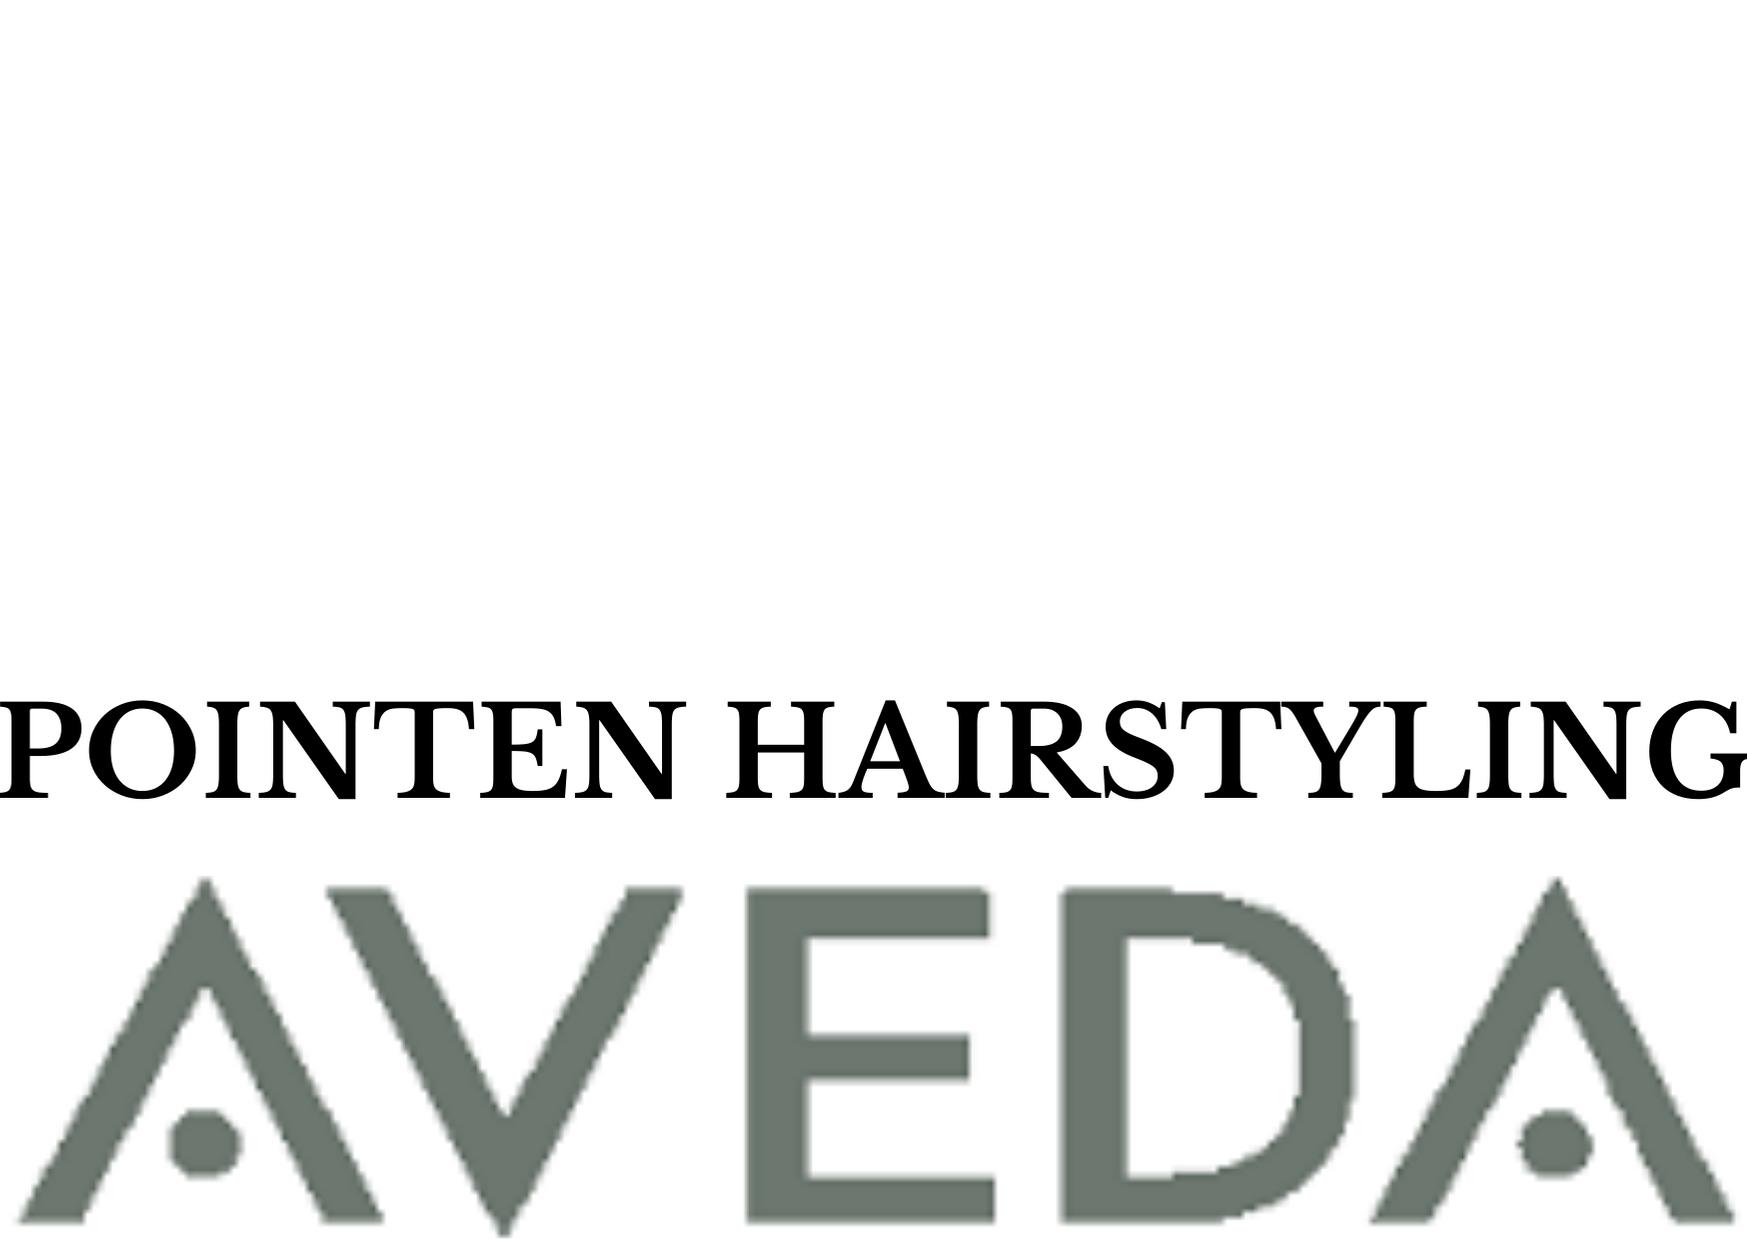 Kapper Huizen - Kapsalon POINTEN HAIRSTYLING AVEDA HAIR AND LIFESTYLE SALON